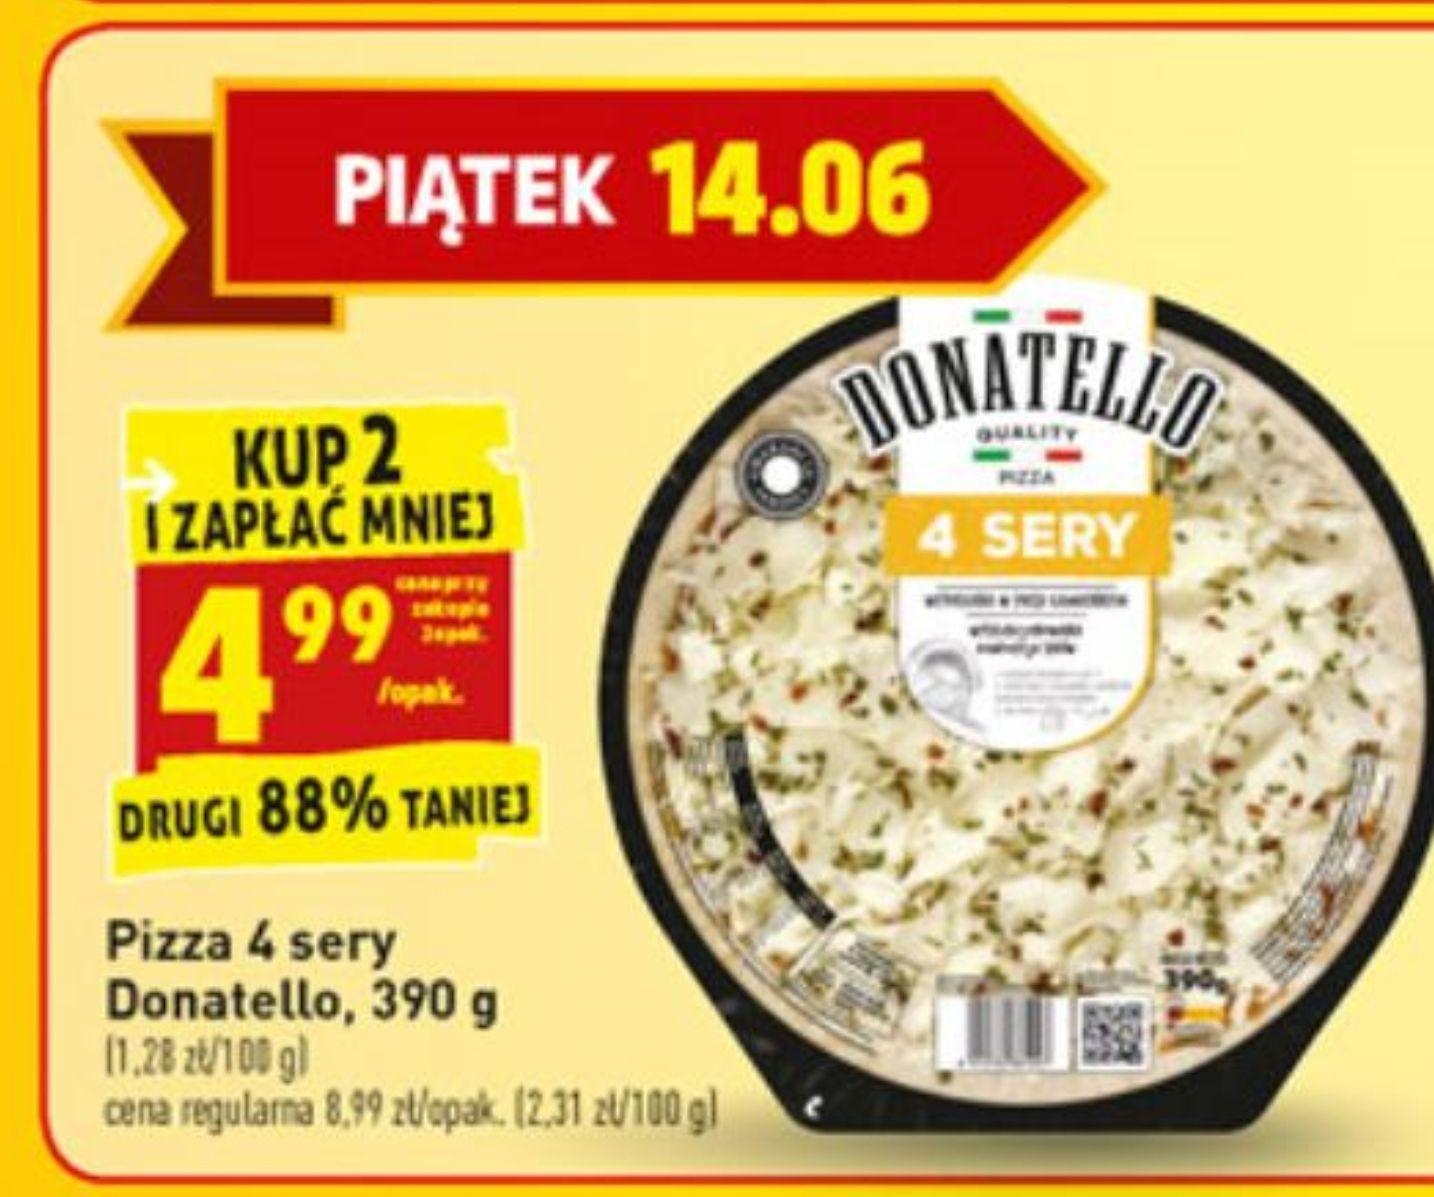 Pizza 4 sery Biedronka 14.06